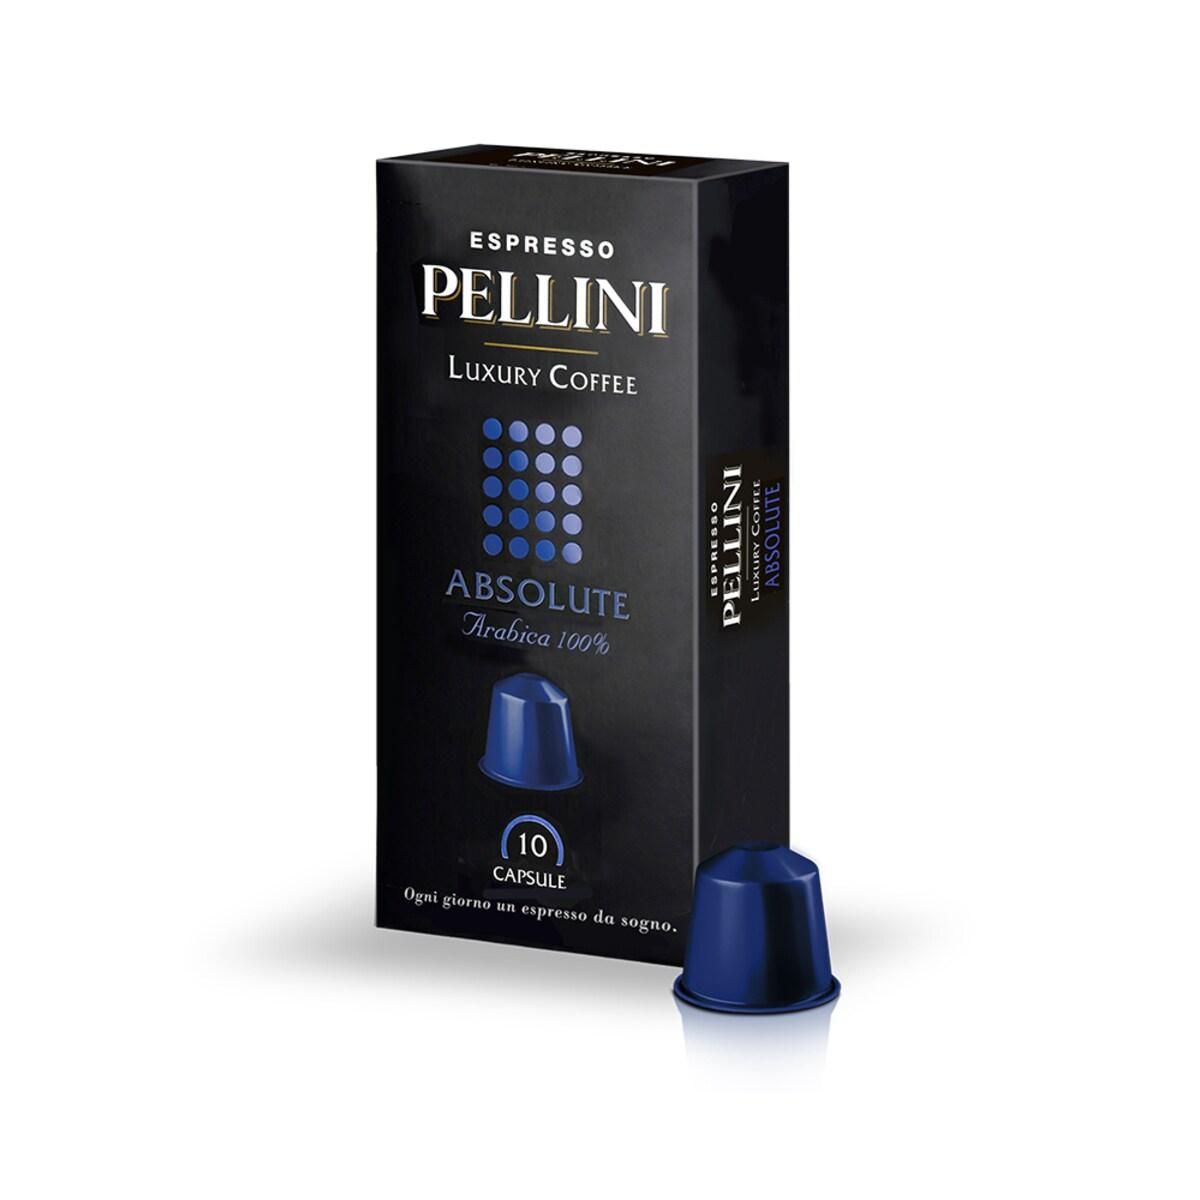 Pellini Absolute Nespresso съвместими капсули 10бр